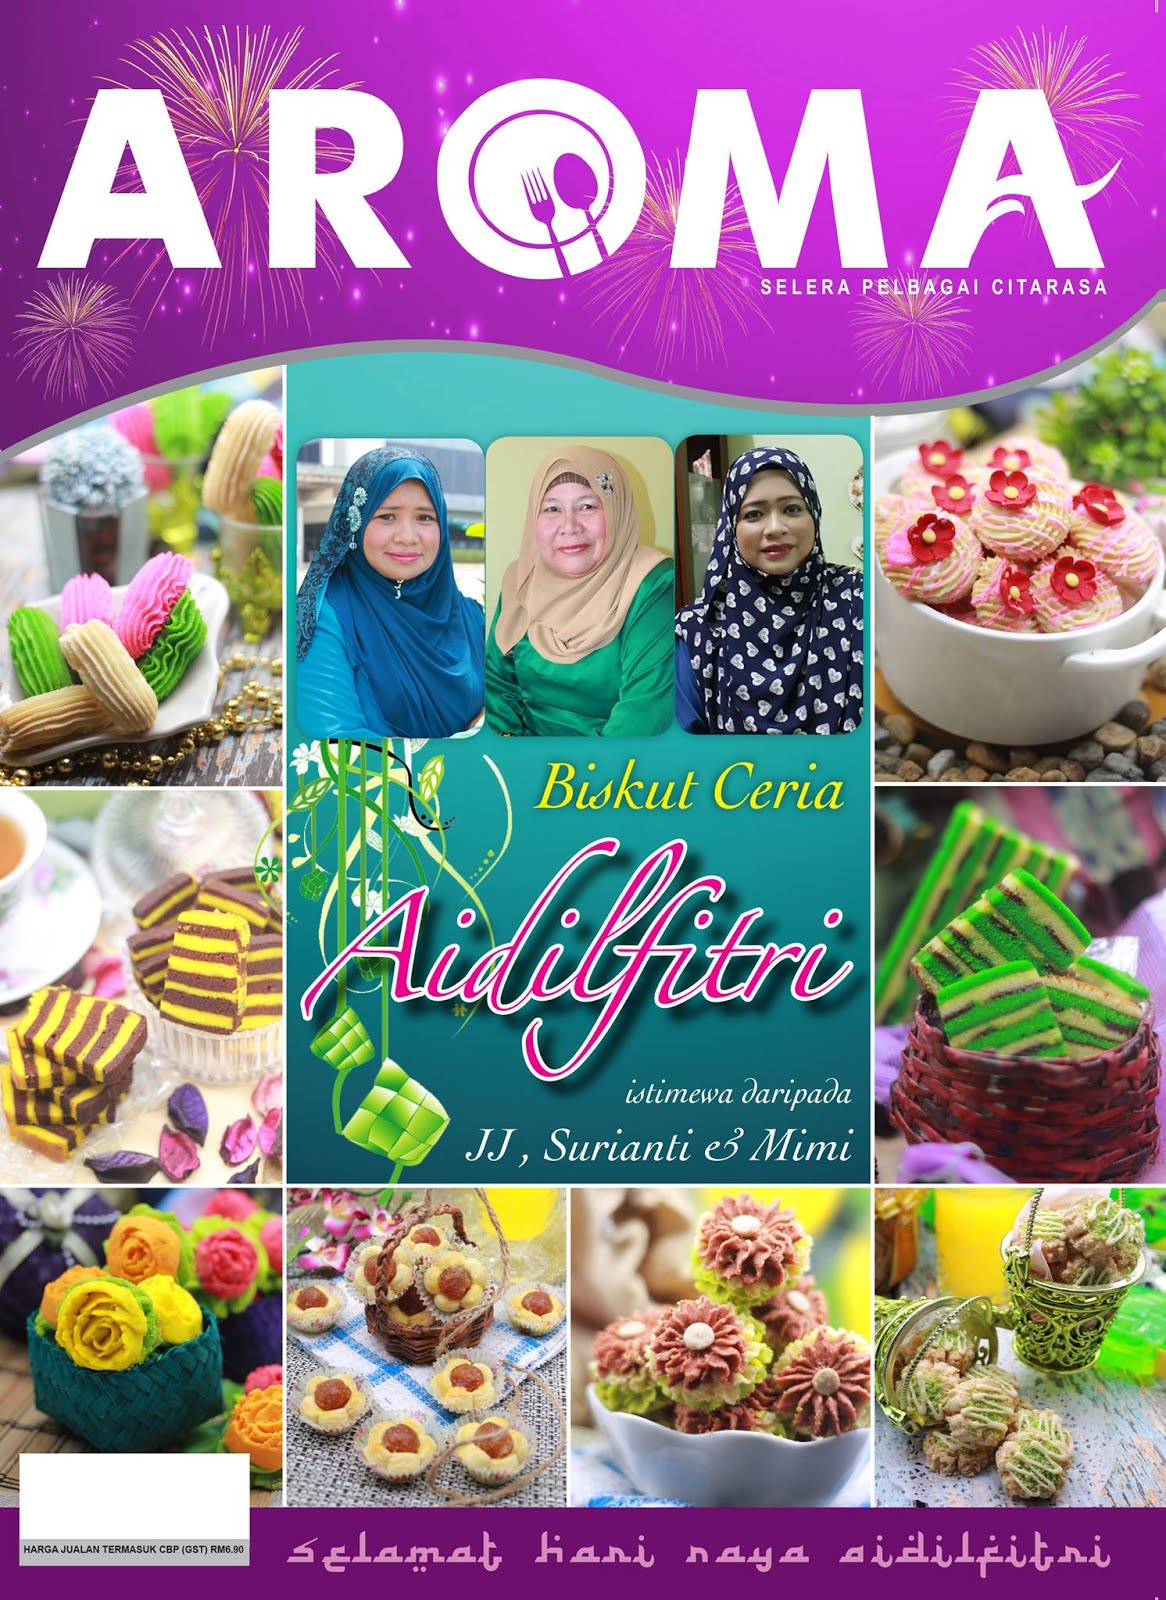 Jendela Dapur Surianti dalam majalah Aroma Raya edisi Julai 2016